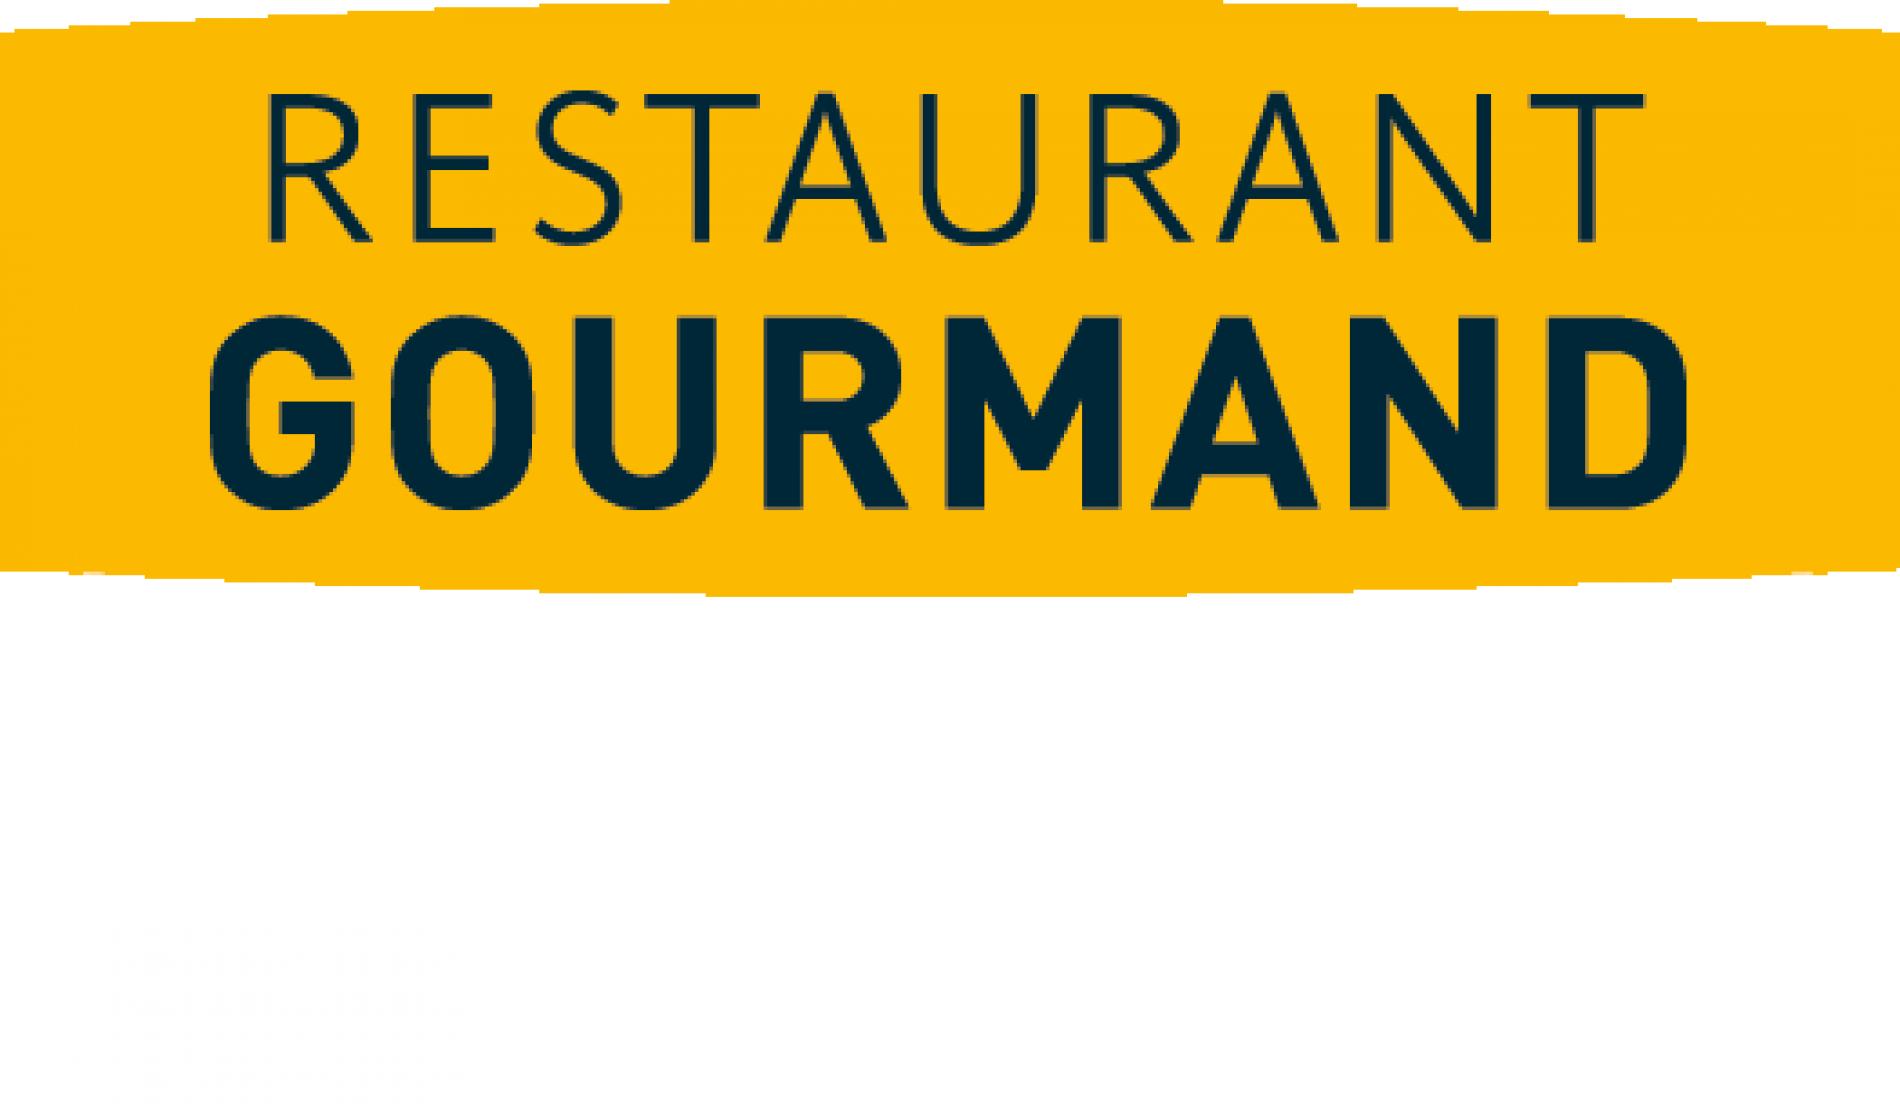 Logis Restaurant Gourmand Le Saint Romain à Anse